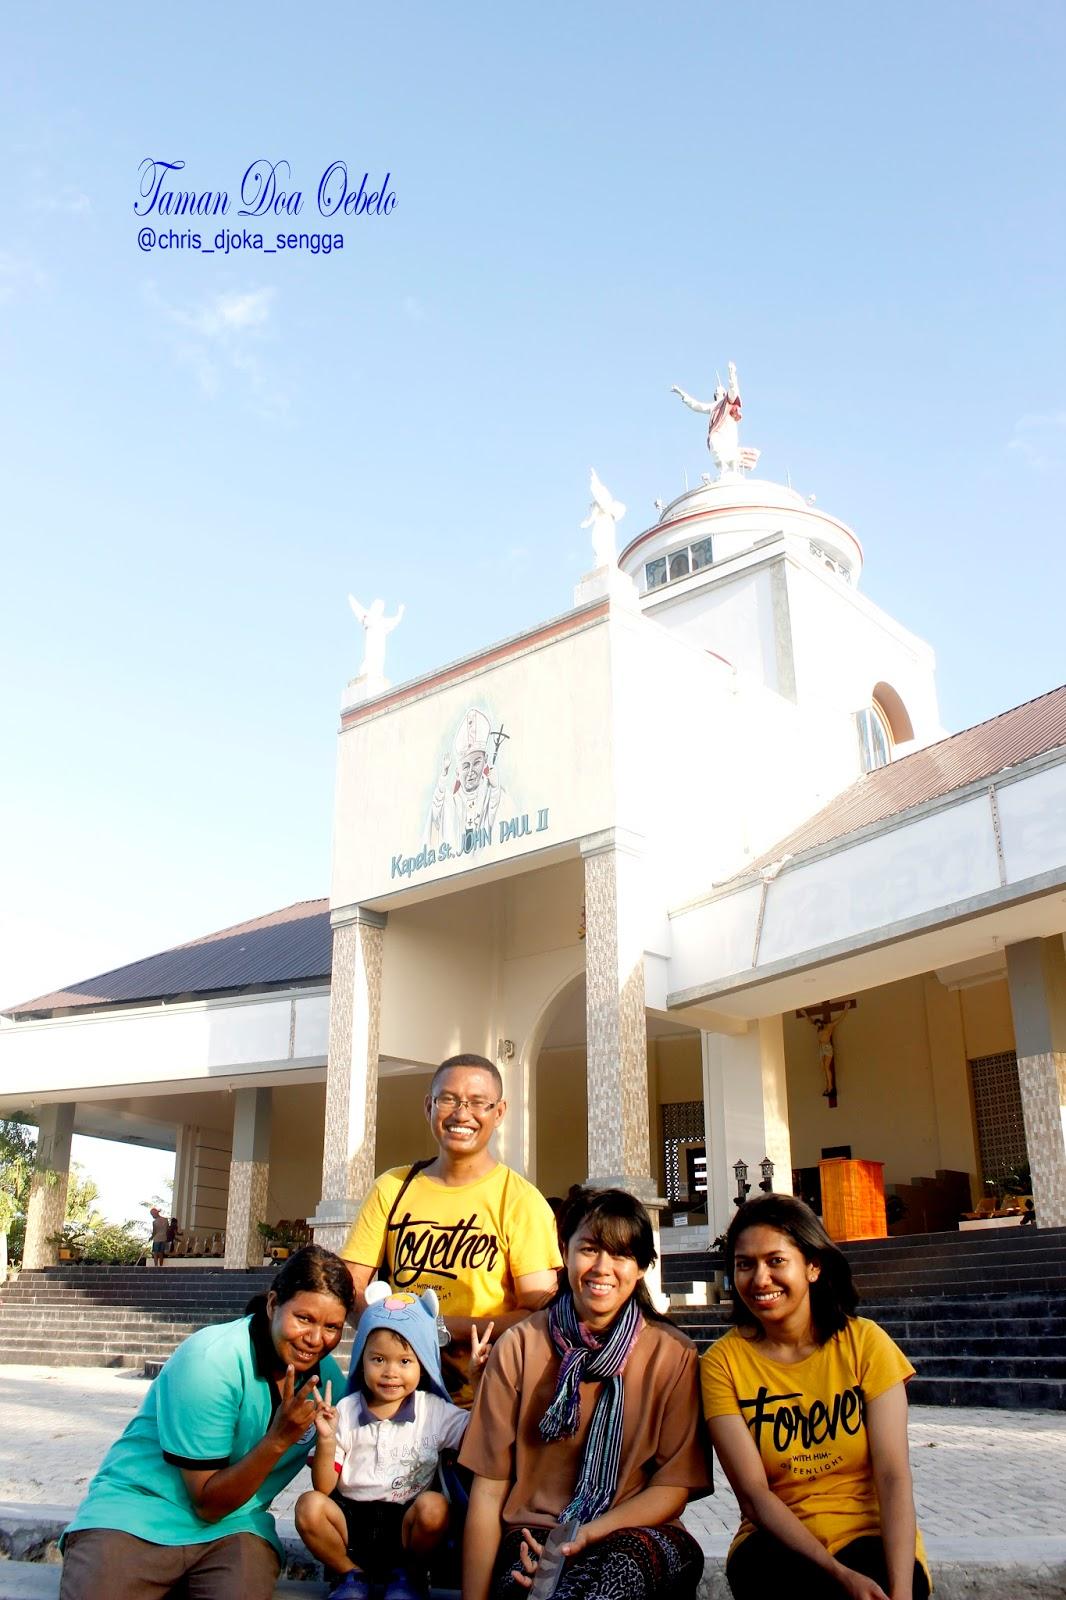 Sunset Kupang Flores Borneo Taman Doa Oebelo Berlatar Kapela St